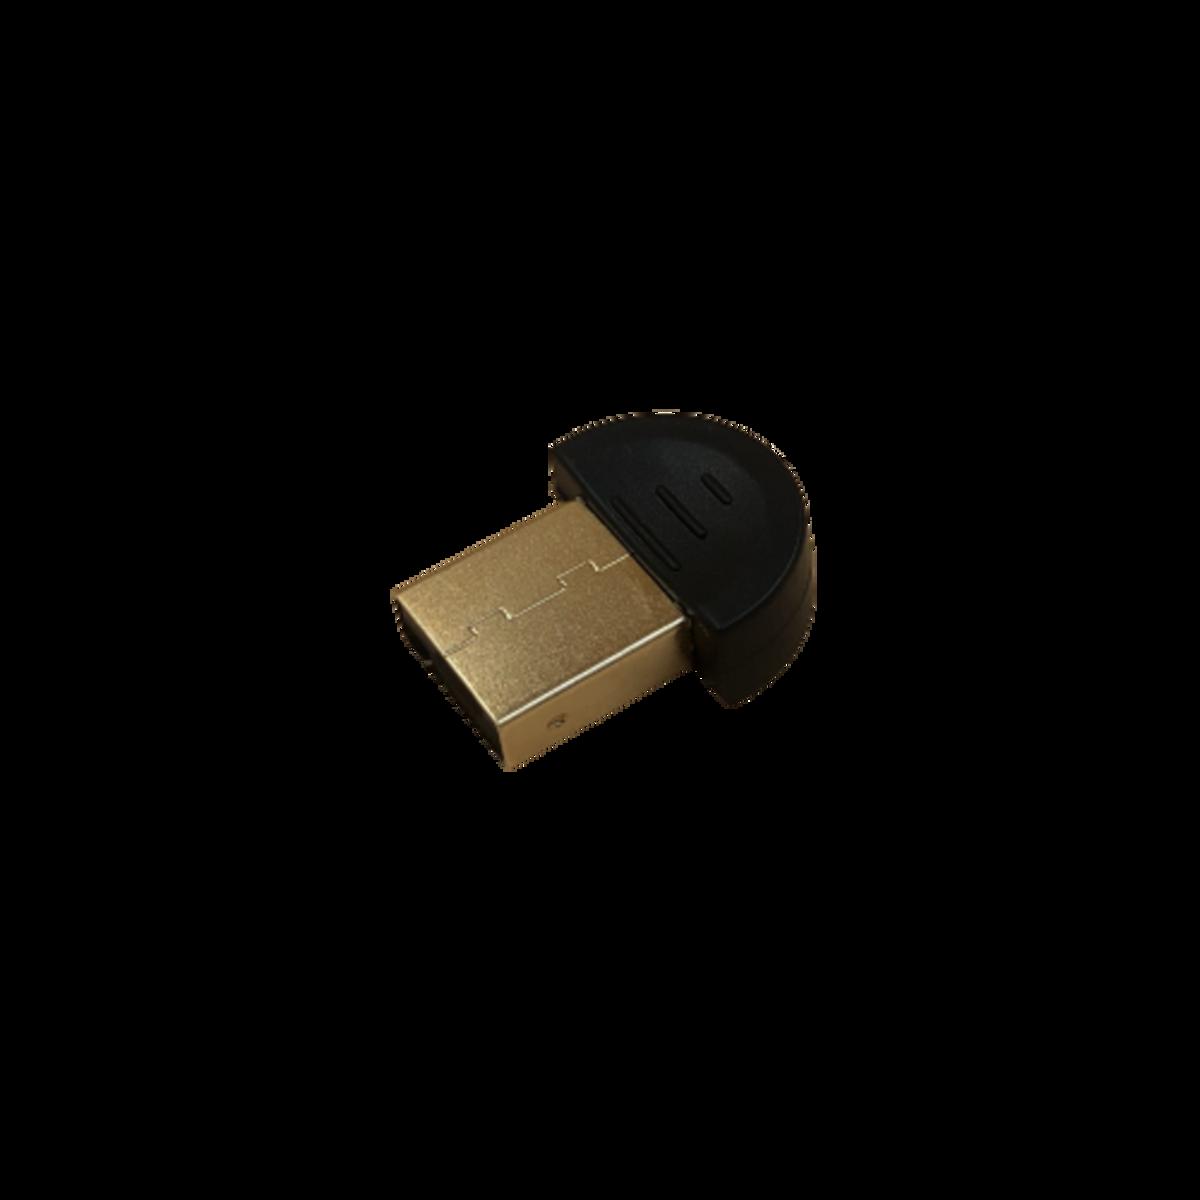 Mini Adaptador Transmissor Bluetooth Dongle USB 5.0